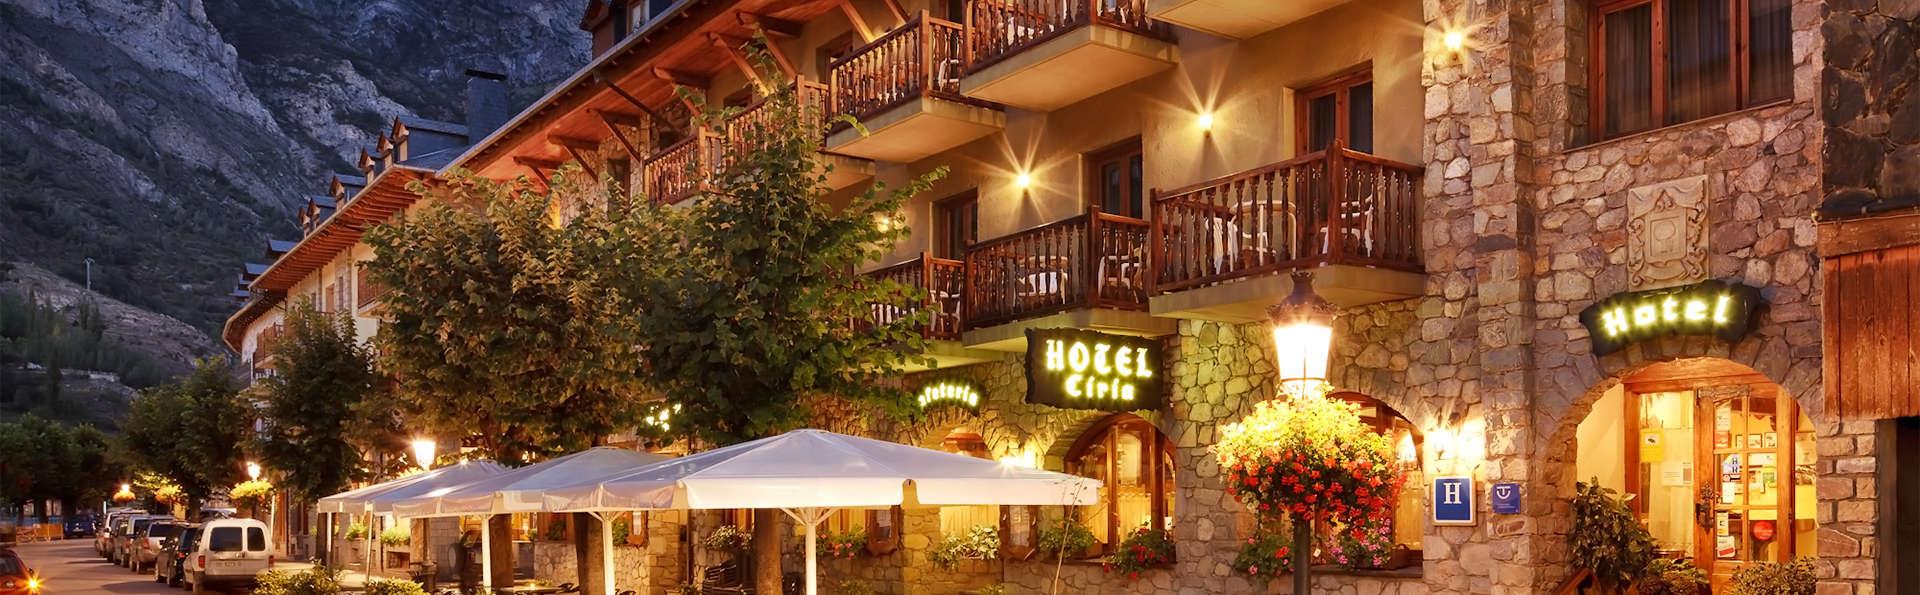 Hotel Ciria - EDIT_front1.jpg